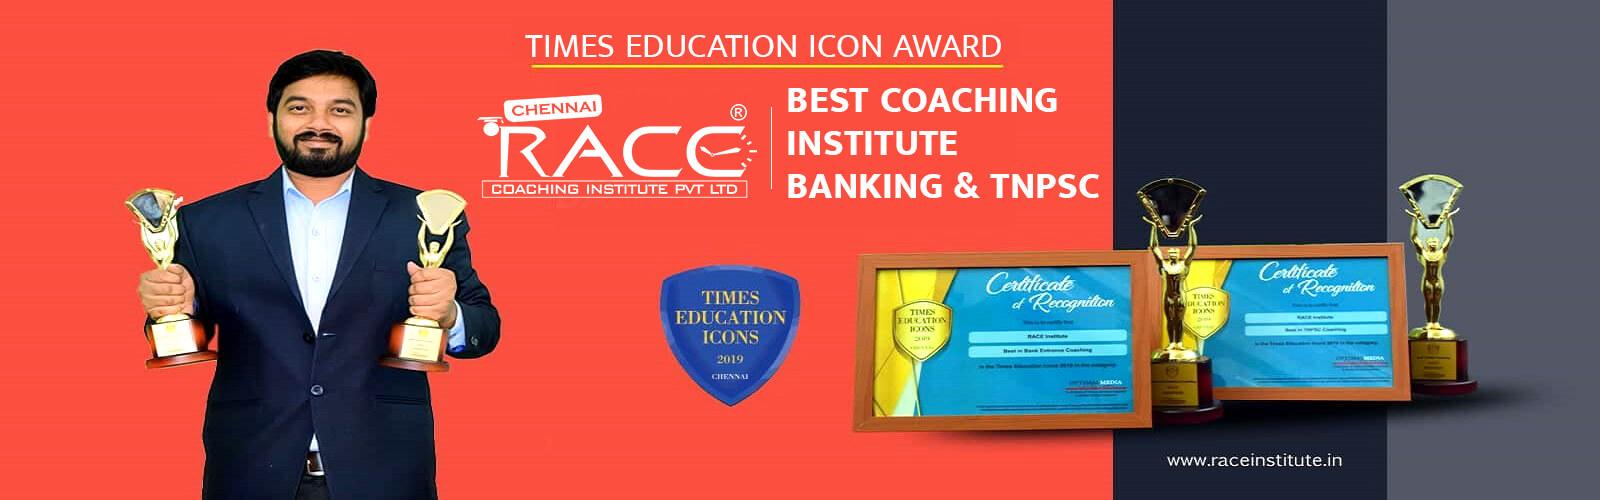 Race-Institute-Best-TNPSC-Coaching-Center-in-Chennai